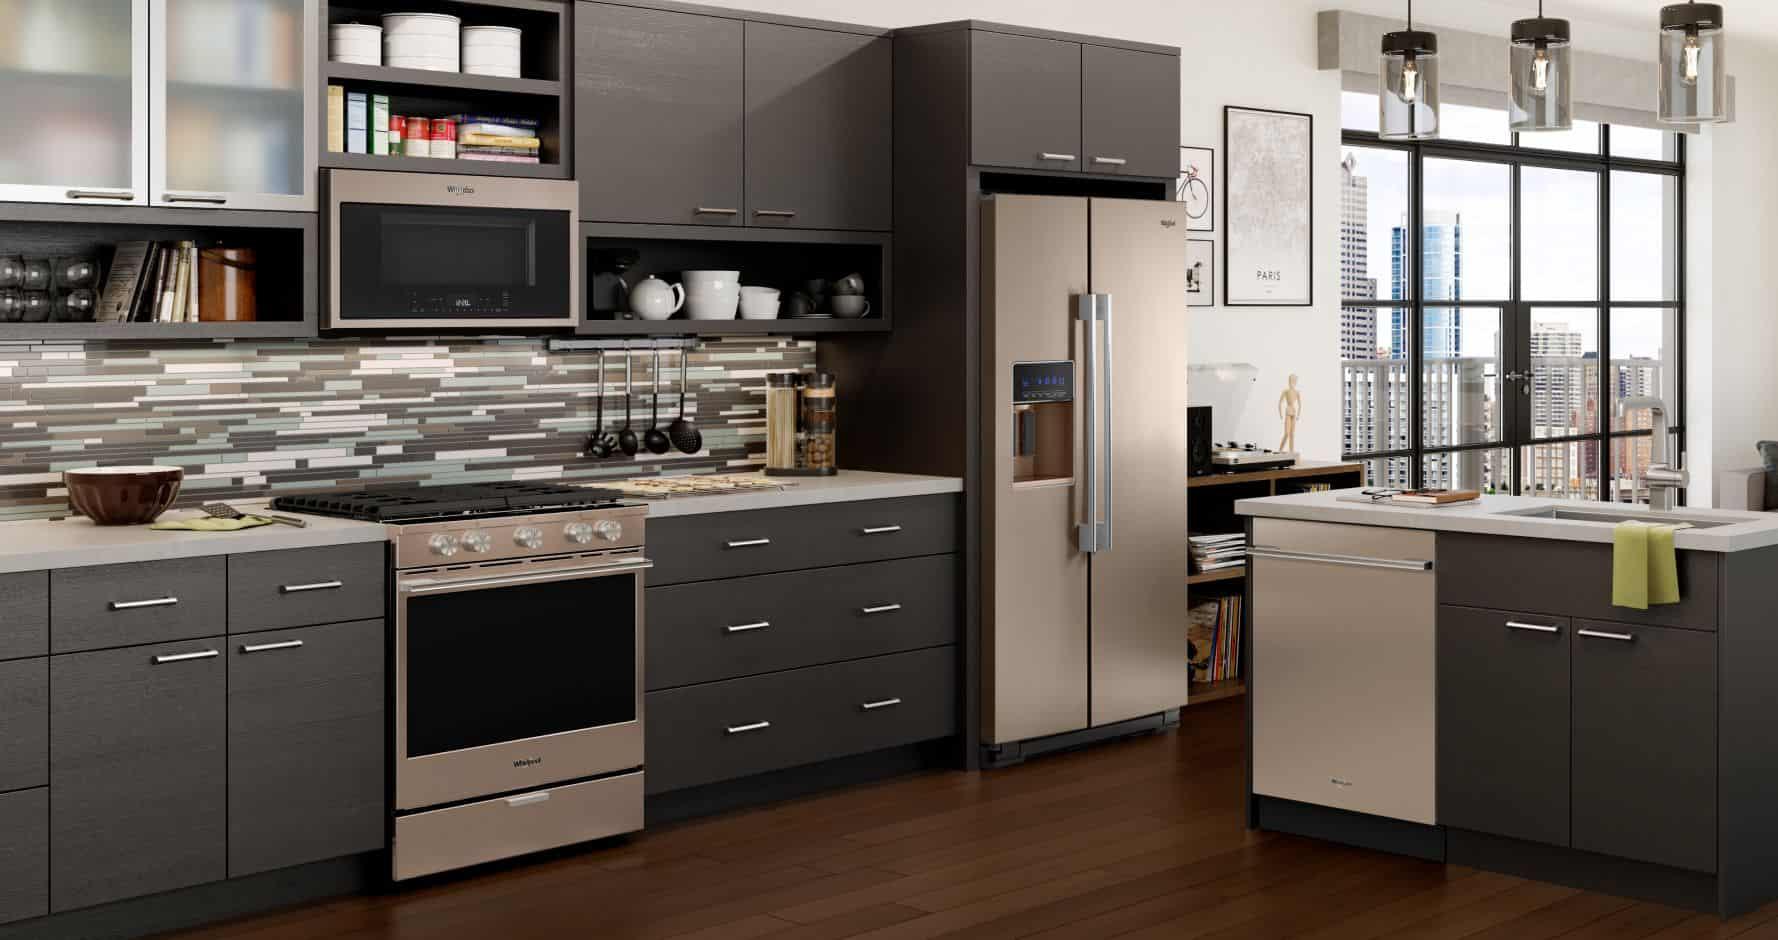 Appliance Repair Service Atlanta Metro Gfy Appliance Repair